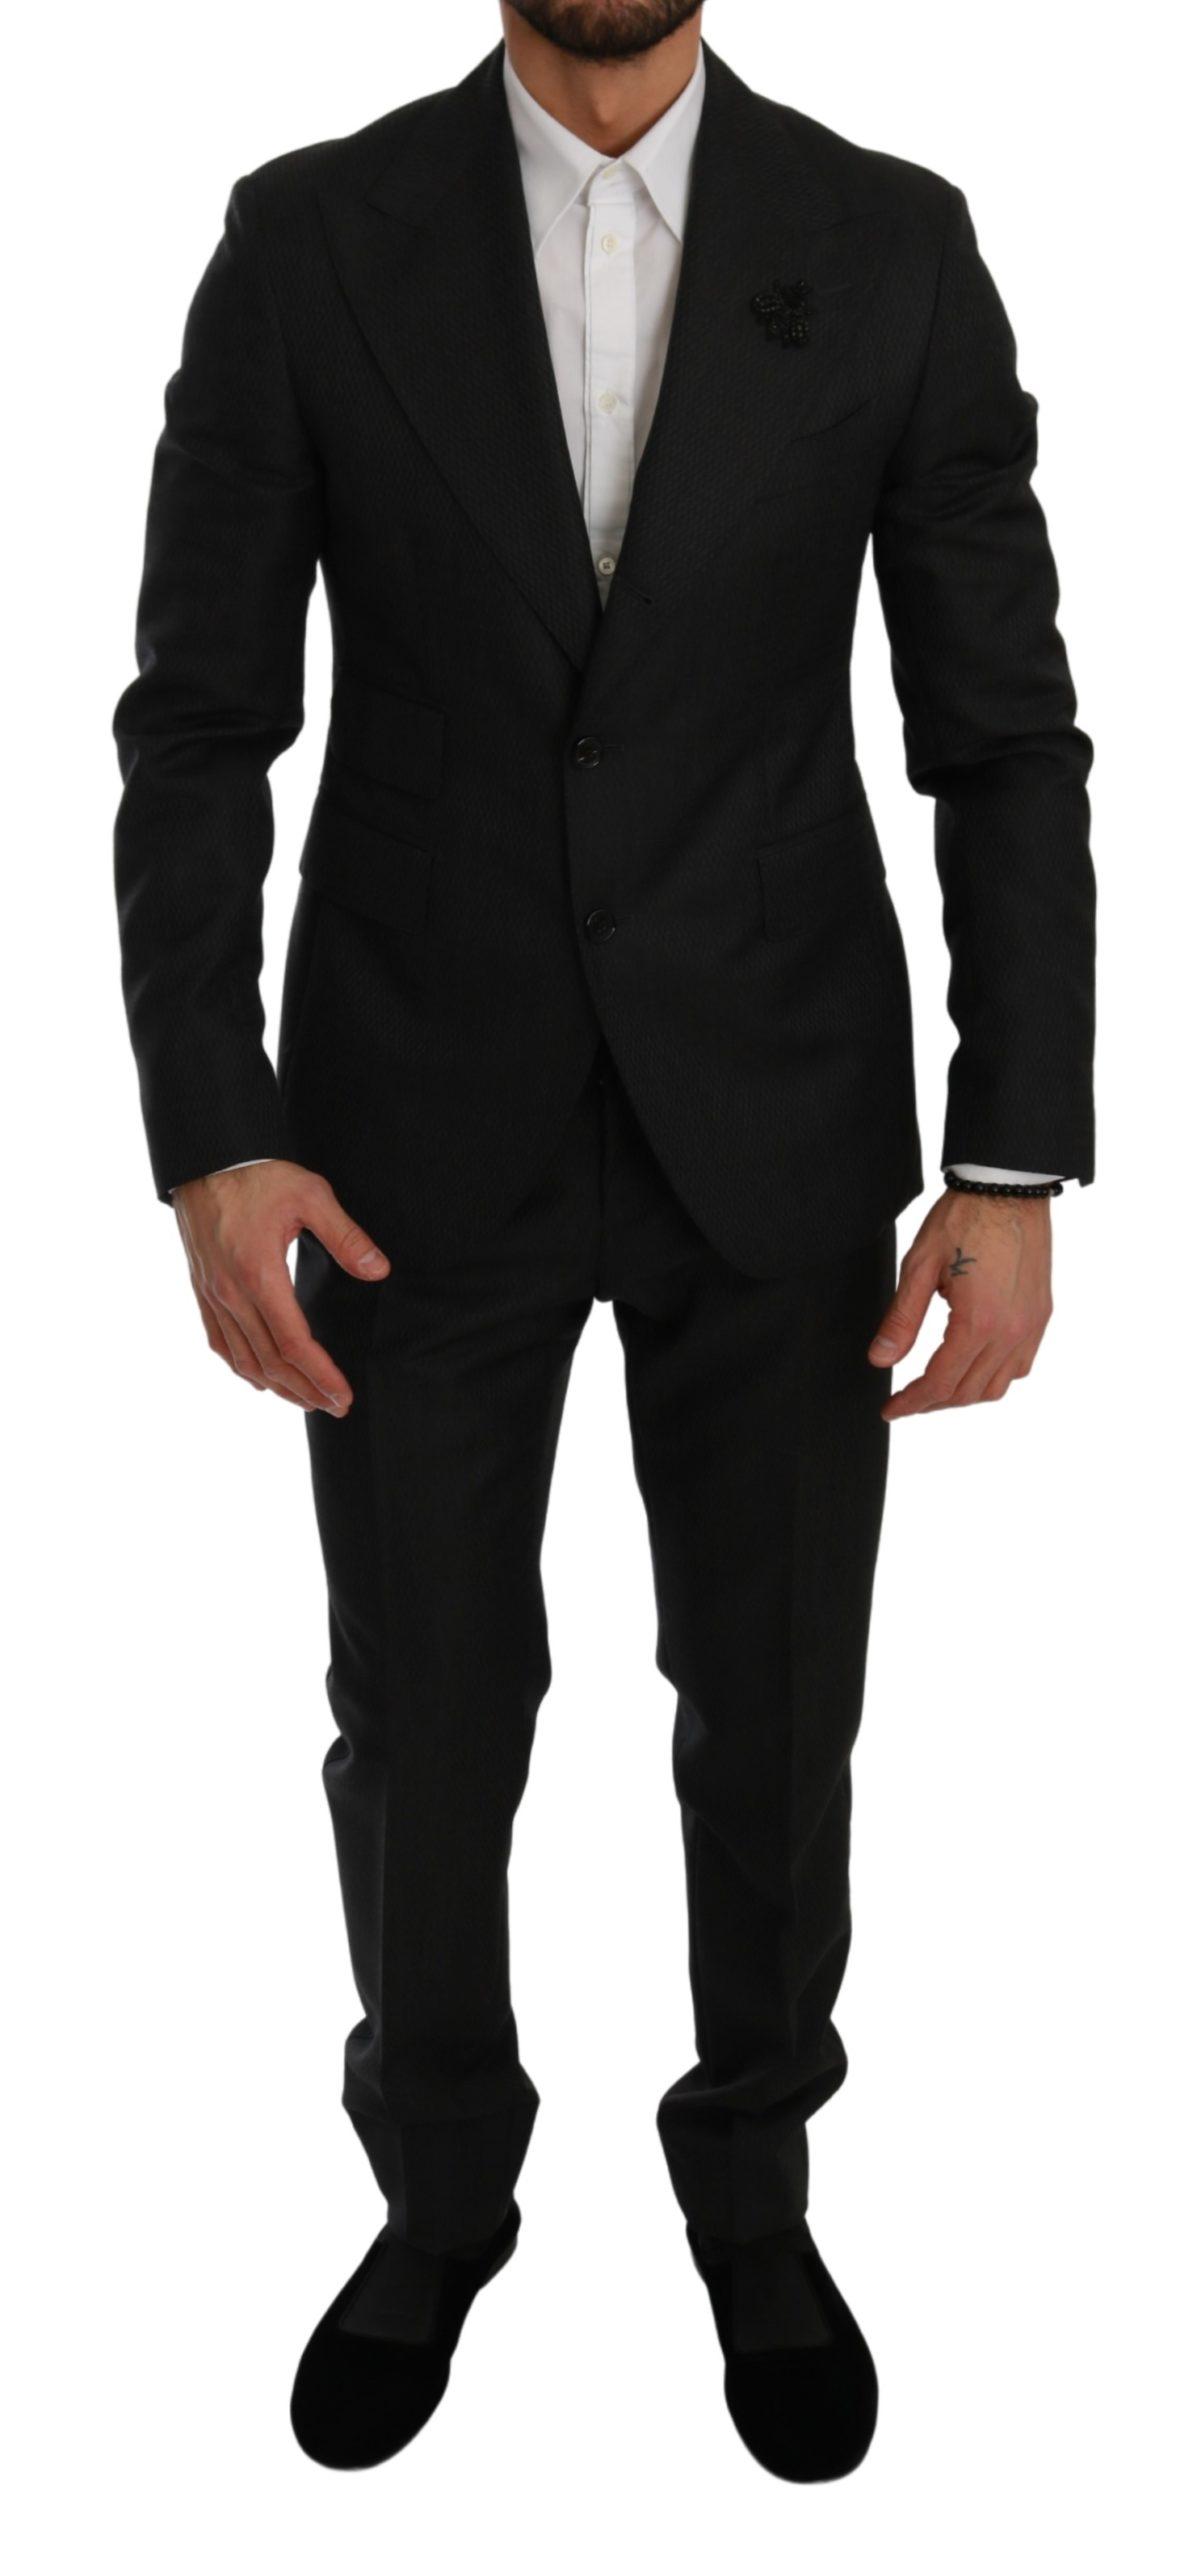 Dolce & Gabbana Men's Crystal Bee Slim Fit 2 Piece Suit Black KOS1781 - IT44 | XS